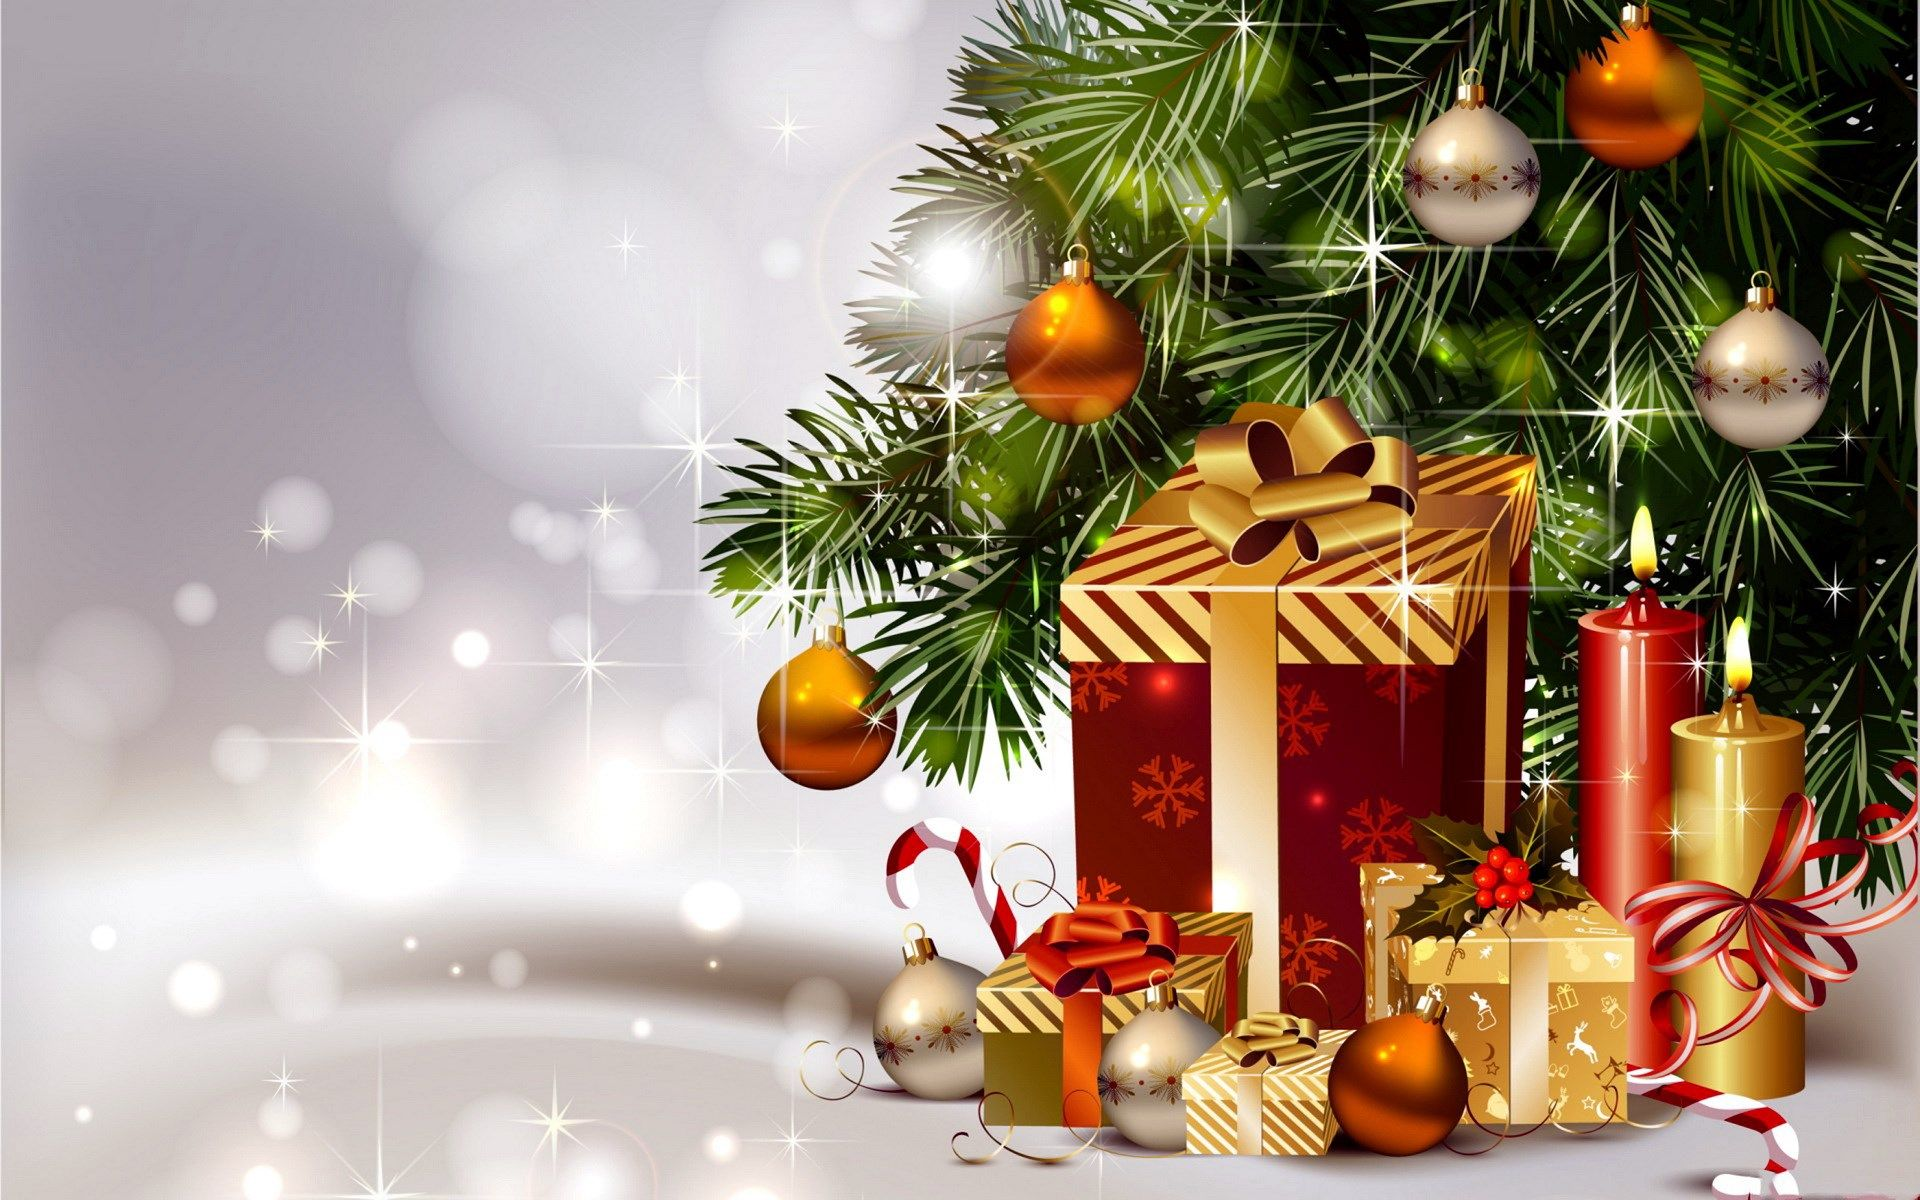 Display Gifts Merry Christmas Hd Wallpaper